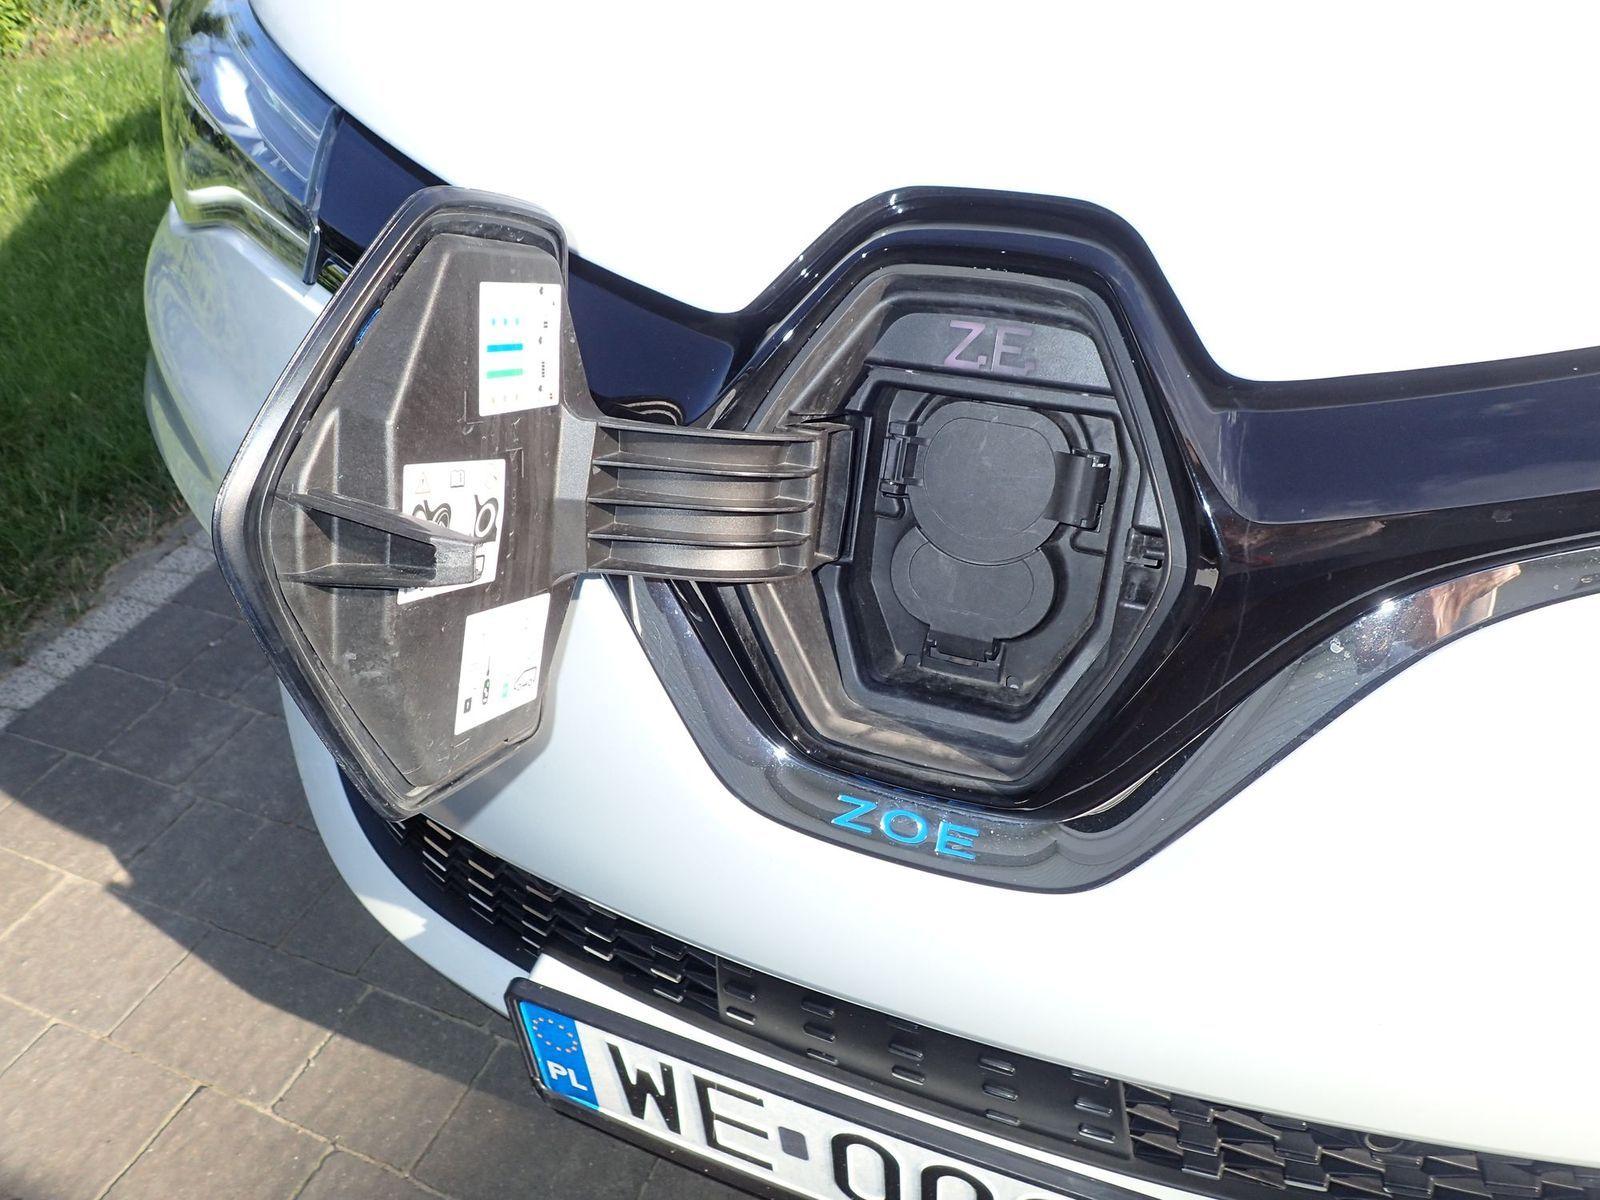 RenaultZoe_2020_test_16